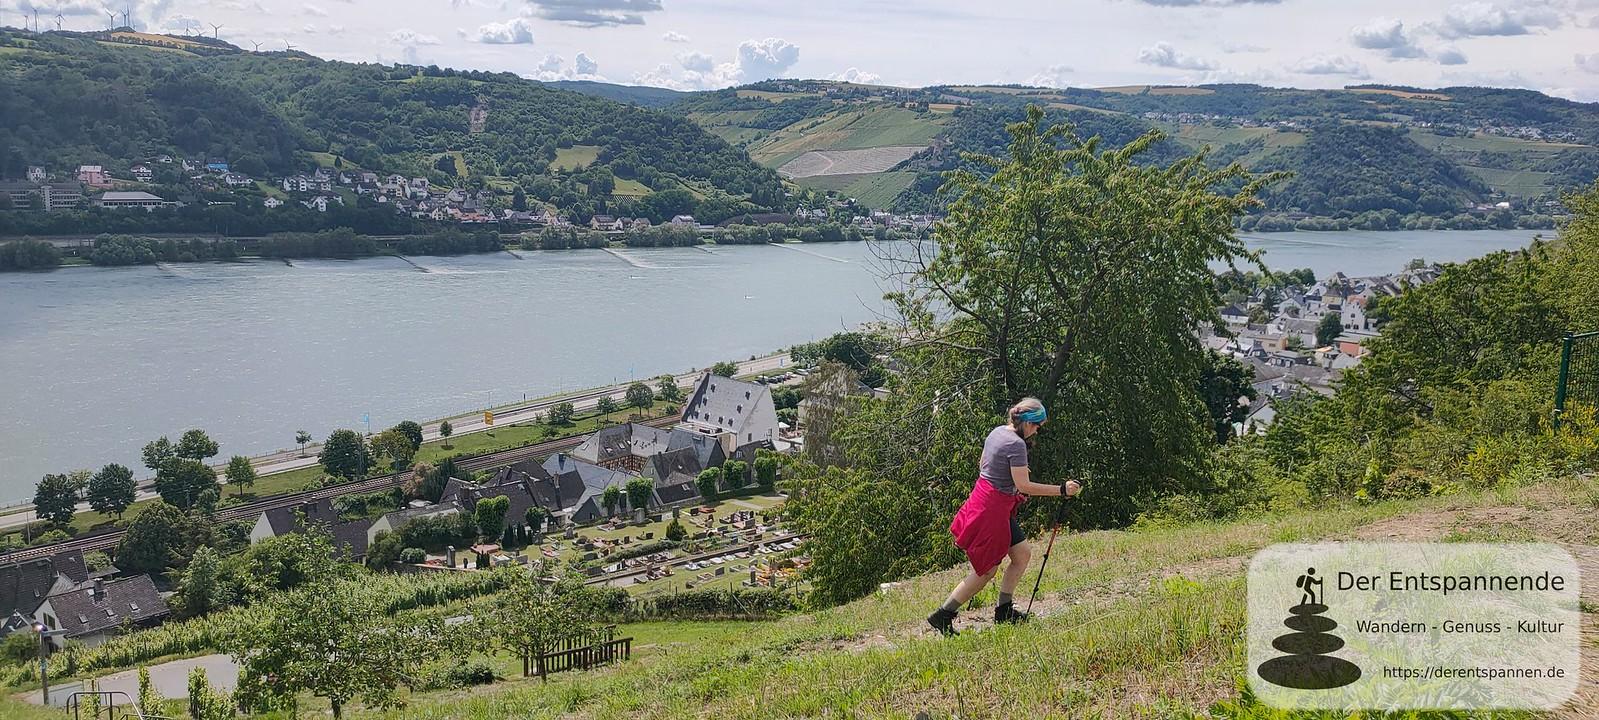 Wisper-Trail bei Lorch: In Vino Veritas